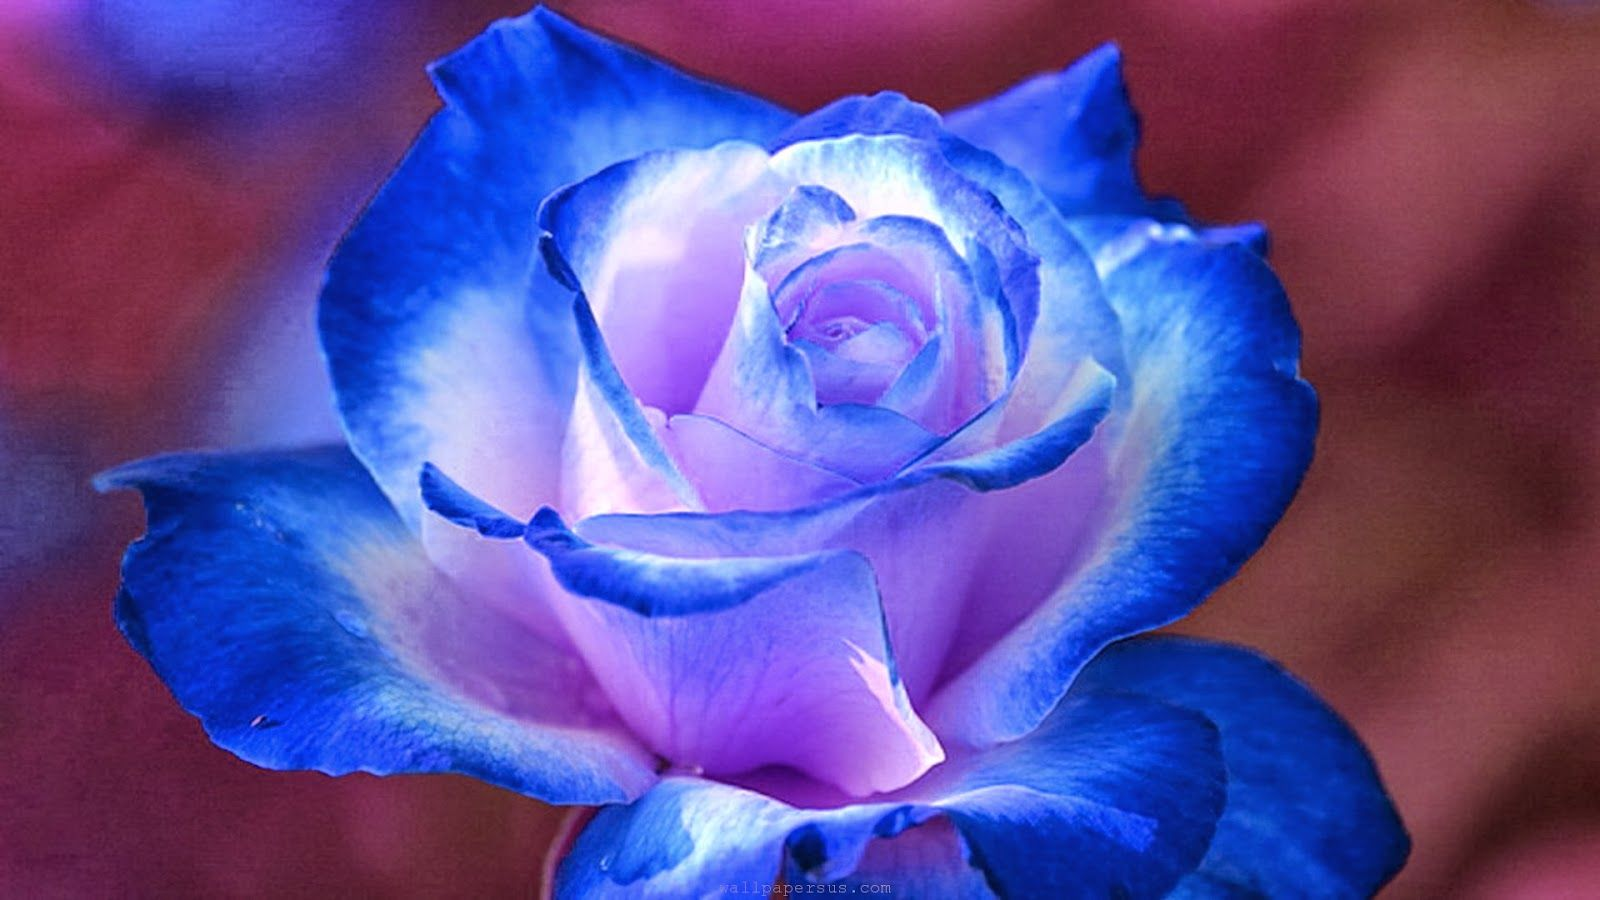 Hd Wallpapers Desktop Blue Flower Hd Wallpapers Blue Flower Wallpaper Blue Roses Wallpaper Rose Flower Pictures